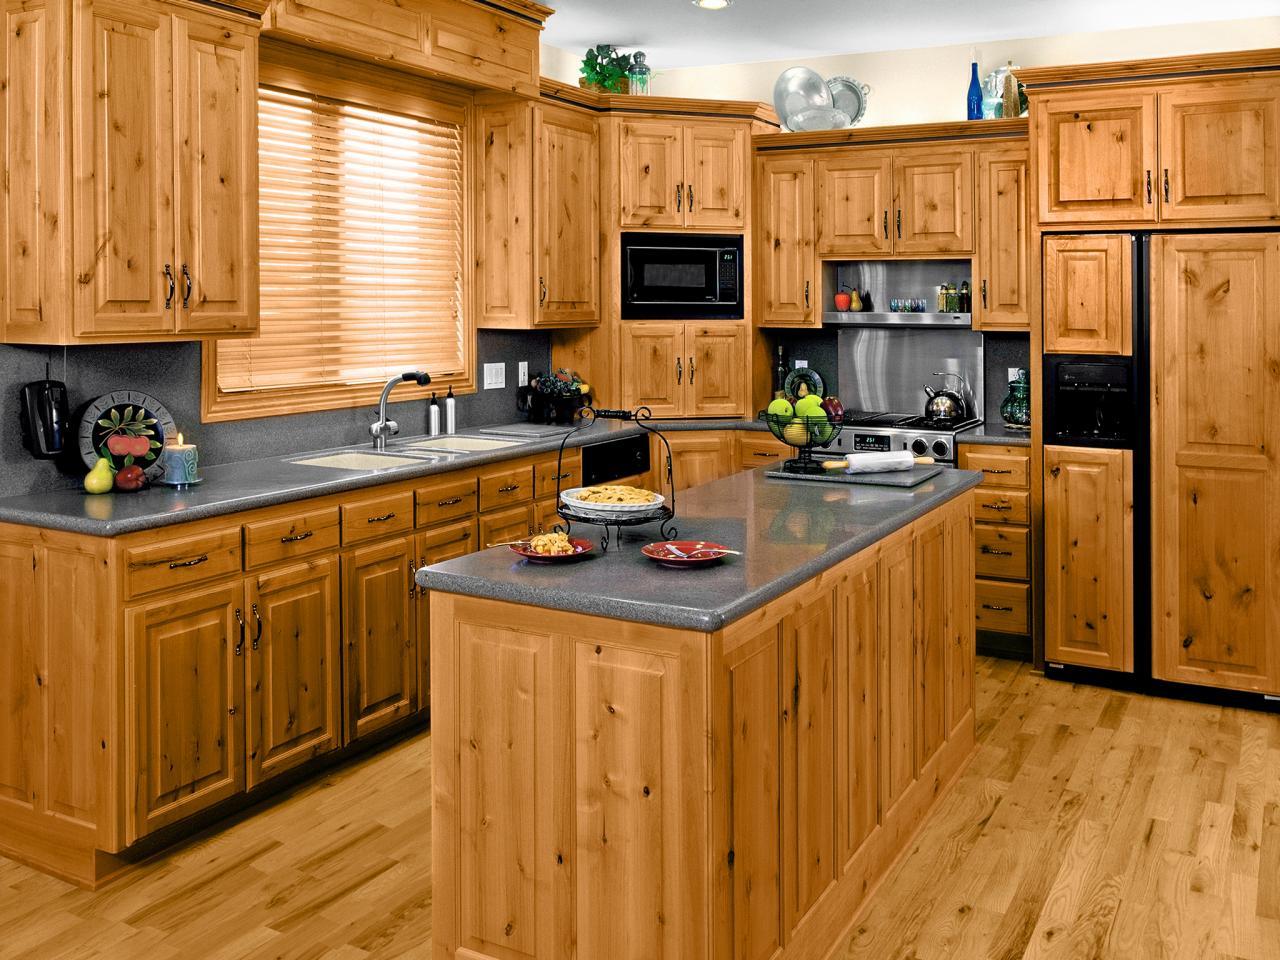 Thomasville Cabinets | Home Depot Bathroom Storage | Cranberry Kitchen Cabinets